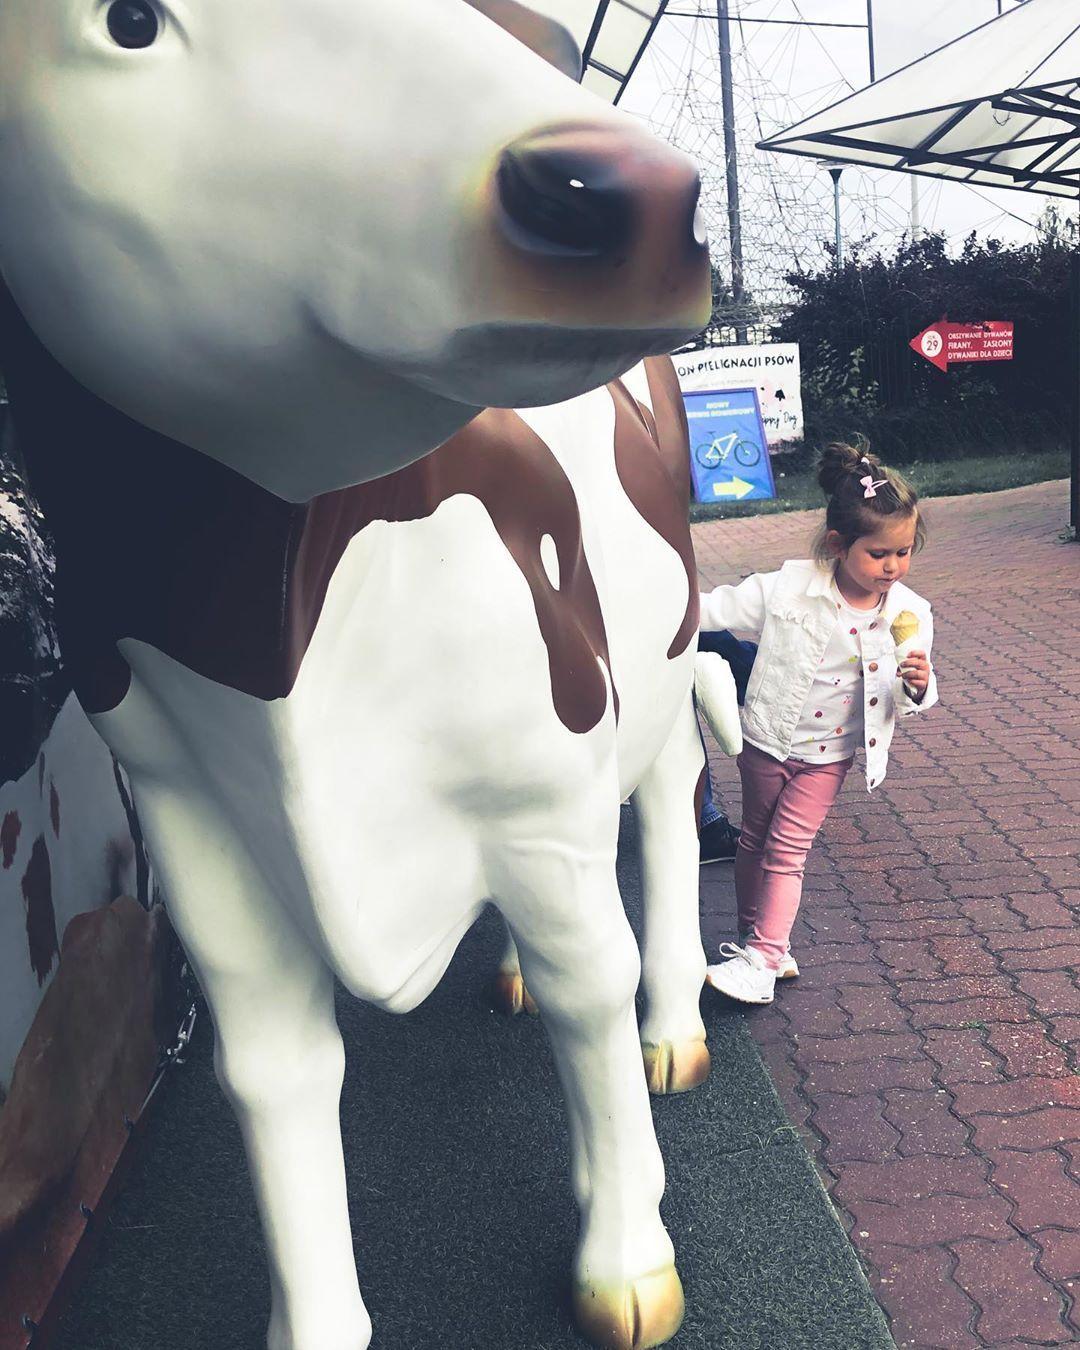 👩👧❤️ . #summer #icecream #babygirl #happyday #ourtime #stroll